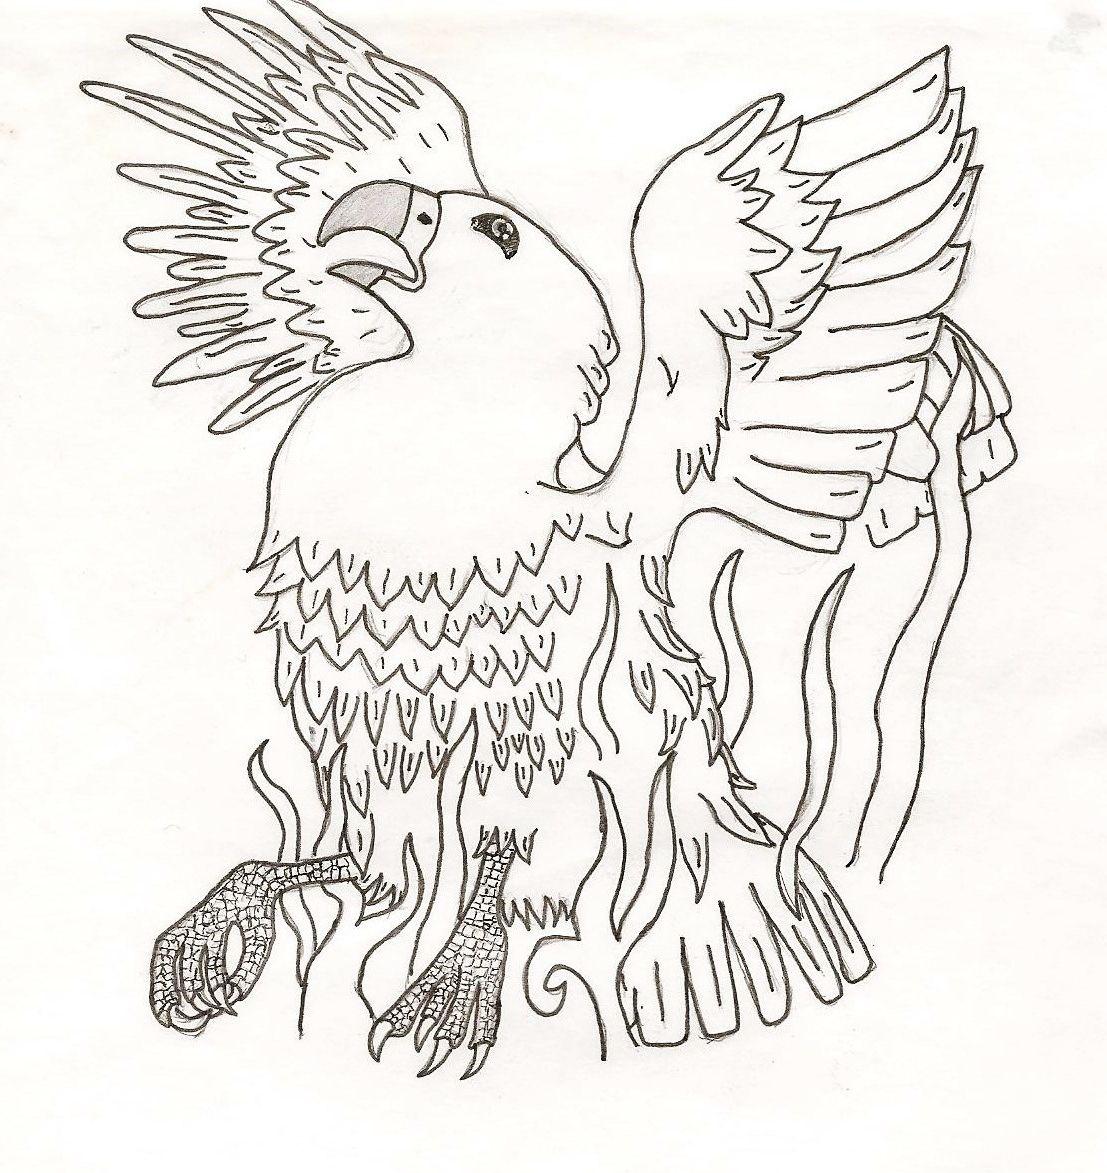 Phoenix By Helen Shellard Easy Art Drawing Sketch Colouring Page Nature Mythology Bird Animal Art Drawings Sketches Coloring Pages Nature Art Design